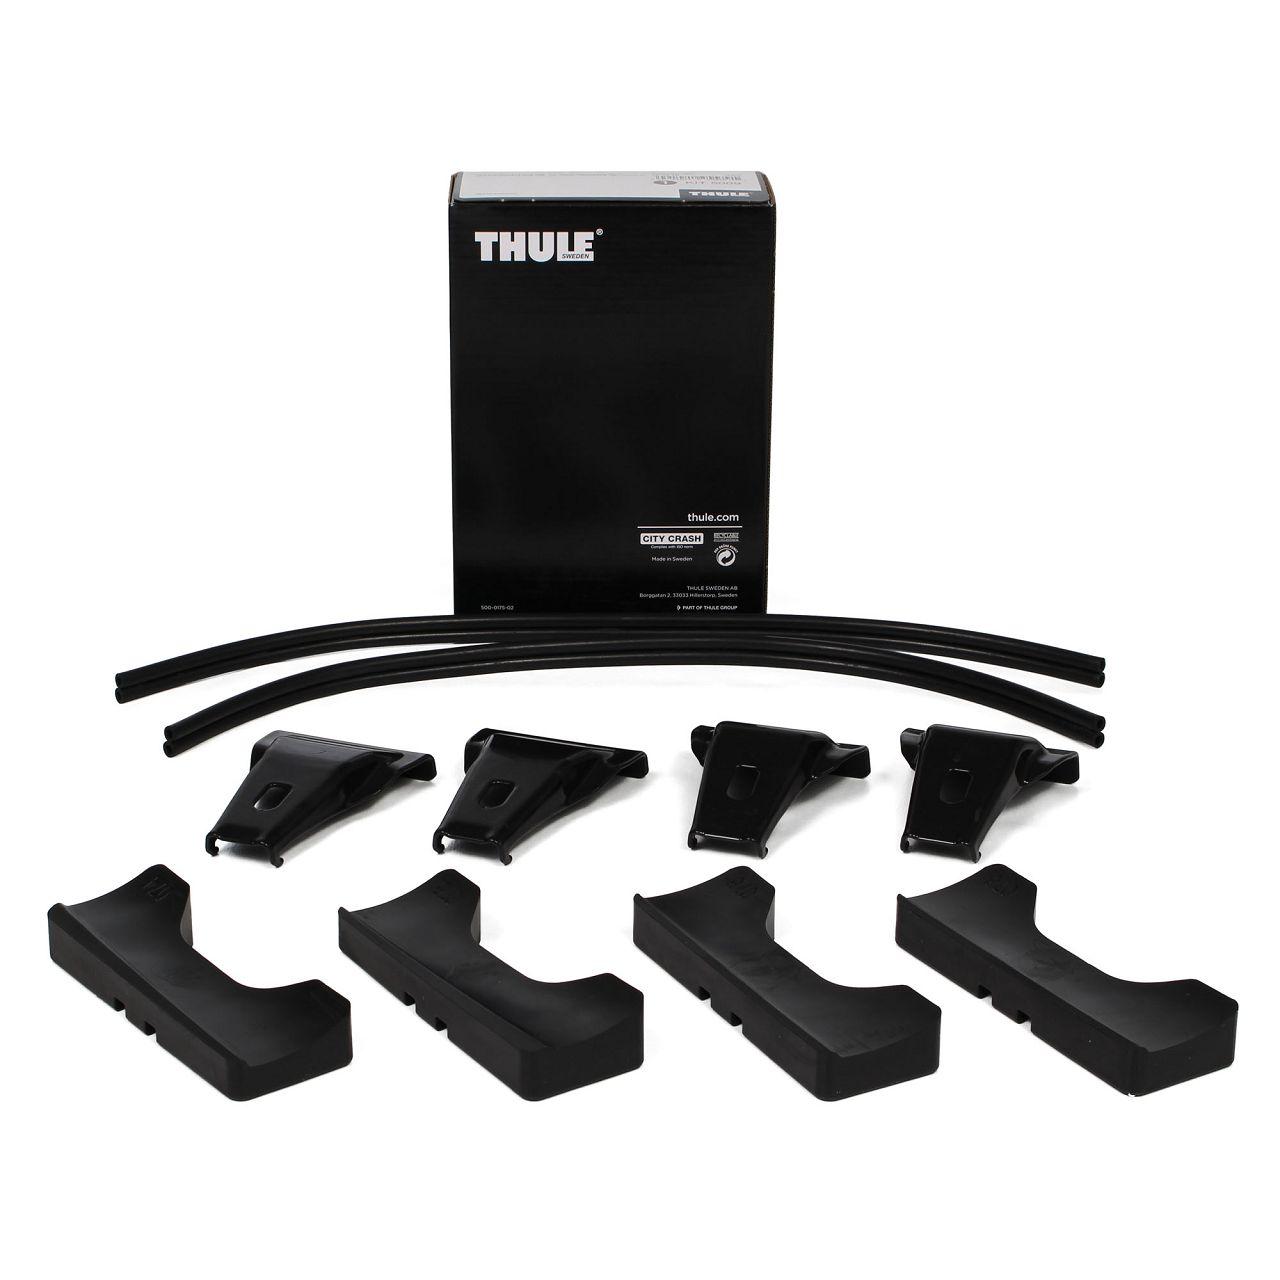 THULE Kit 5009 Montagesatz Montagekit Dachträger VW Golf 5 (1K1) + Golf 6 (5K1)